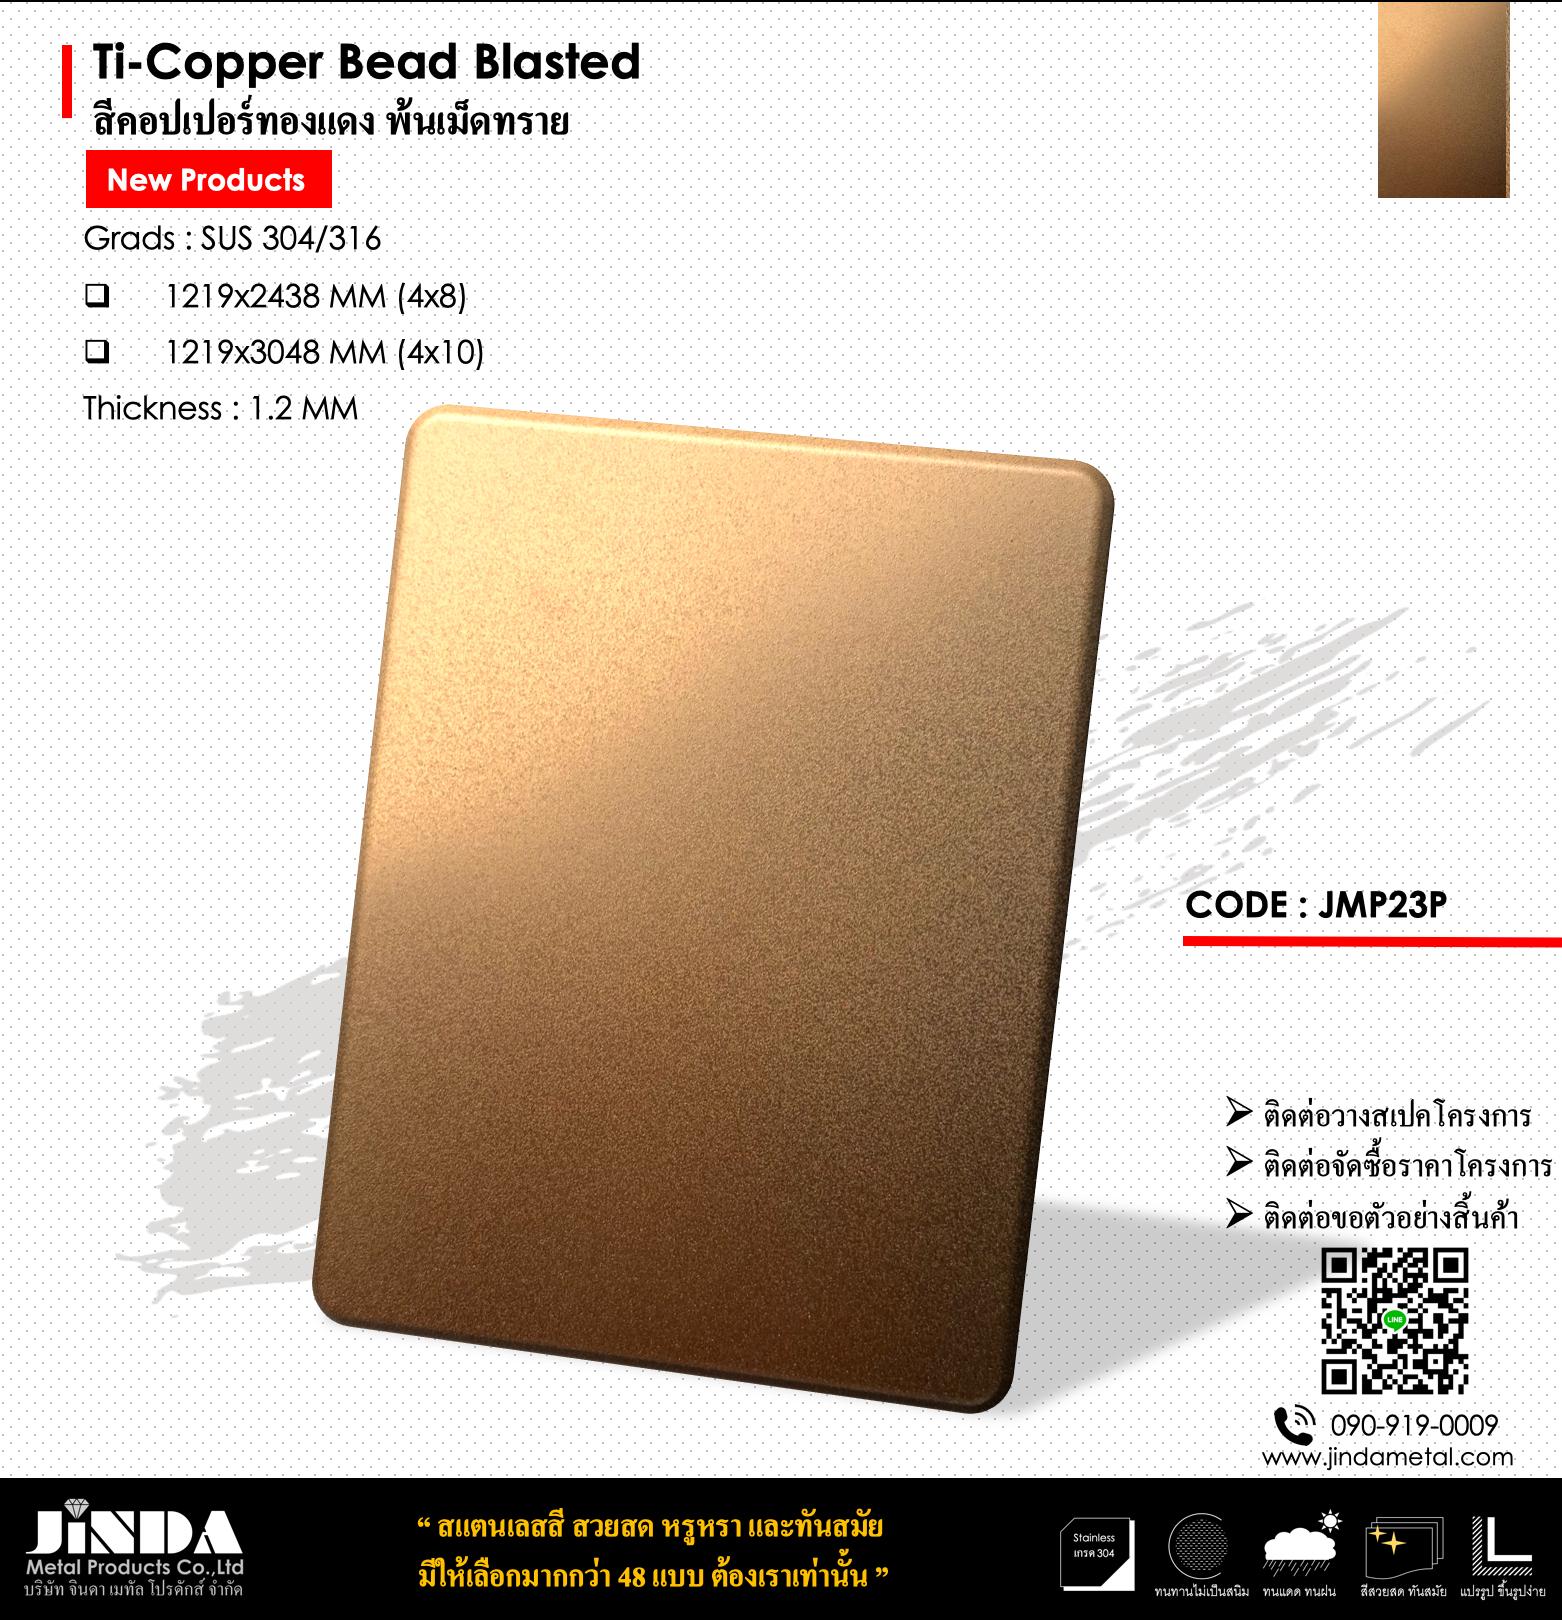 Ti-Copper Bead Blasted  สีคอปเปอร์ทองแดง พ้นเม็ดทราย